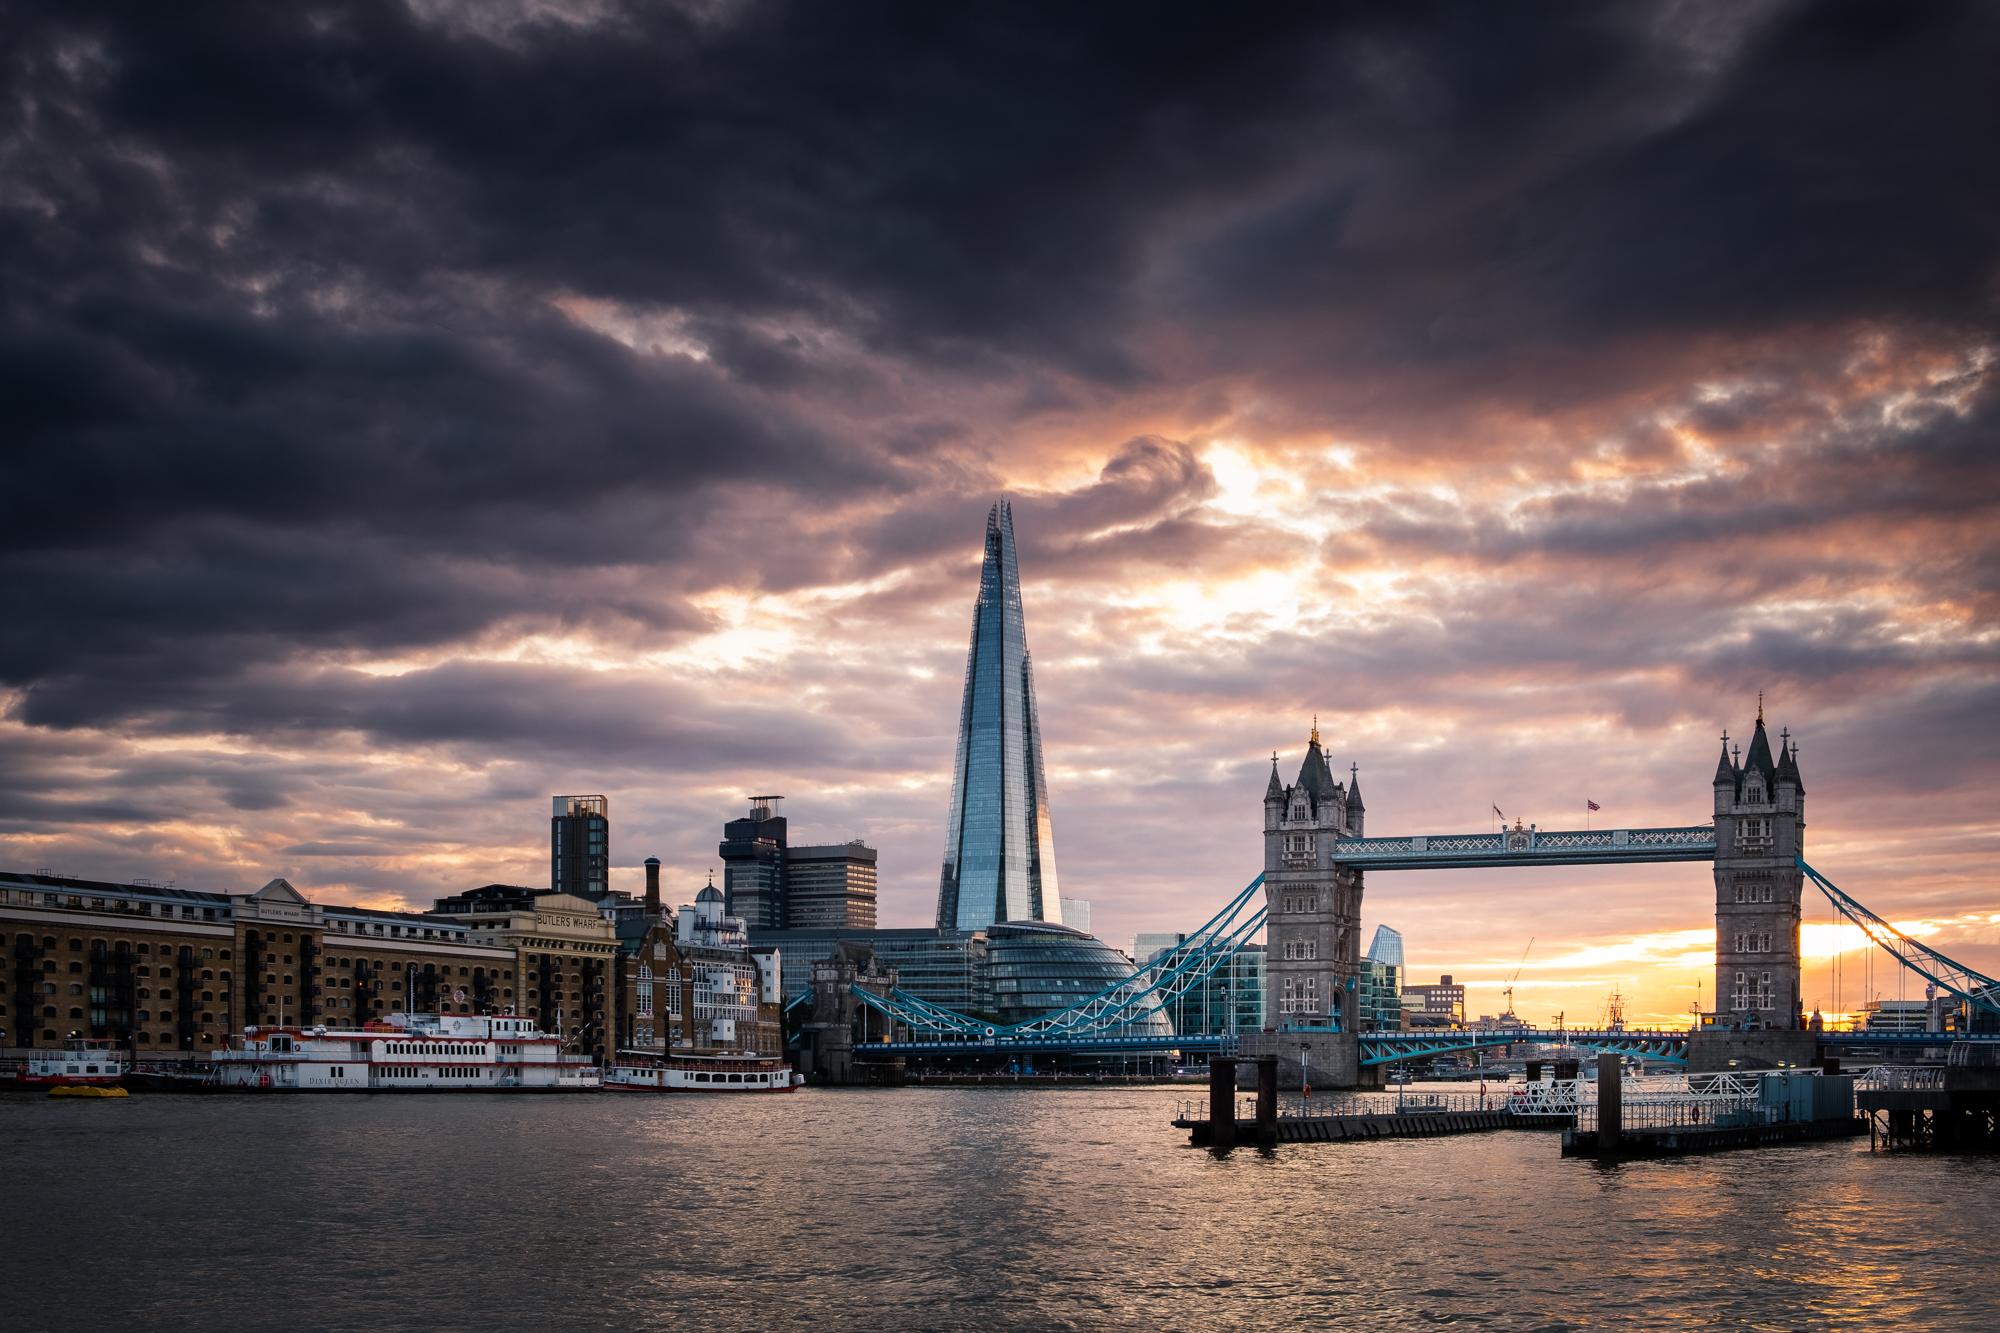 Dramatic London | Fujifilm XT2 | XF18-55mm | 25mm | 1/10th Second | f/8 | ISO200